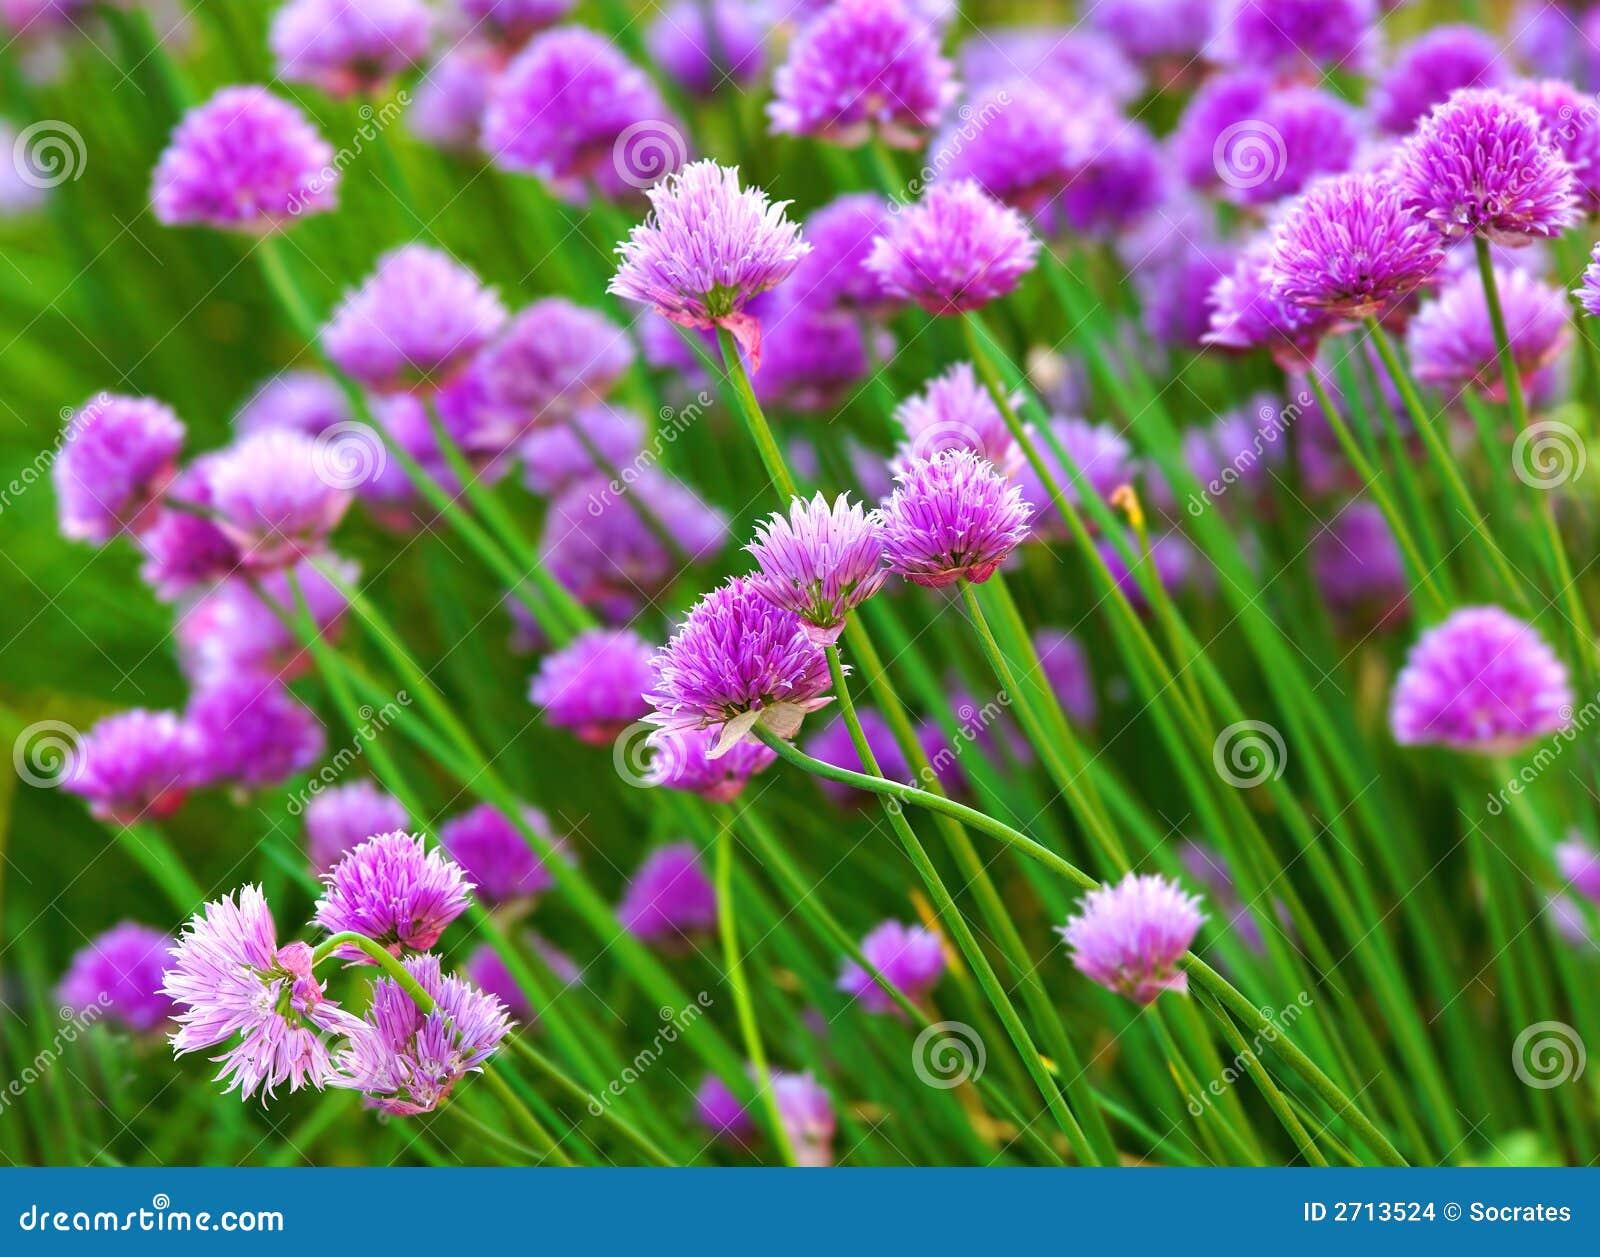 Frangipani spa flowers stock photo image 14654190 - Herb Flowers Stock Images